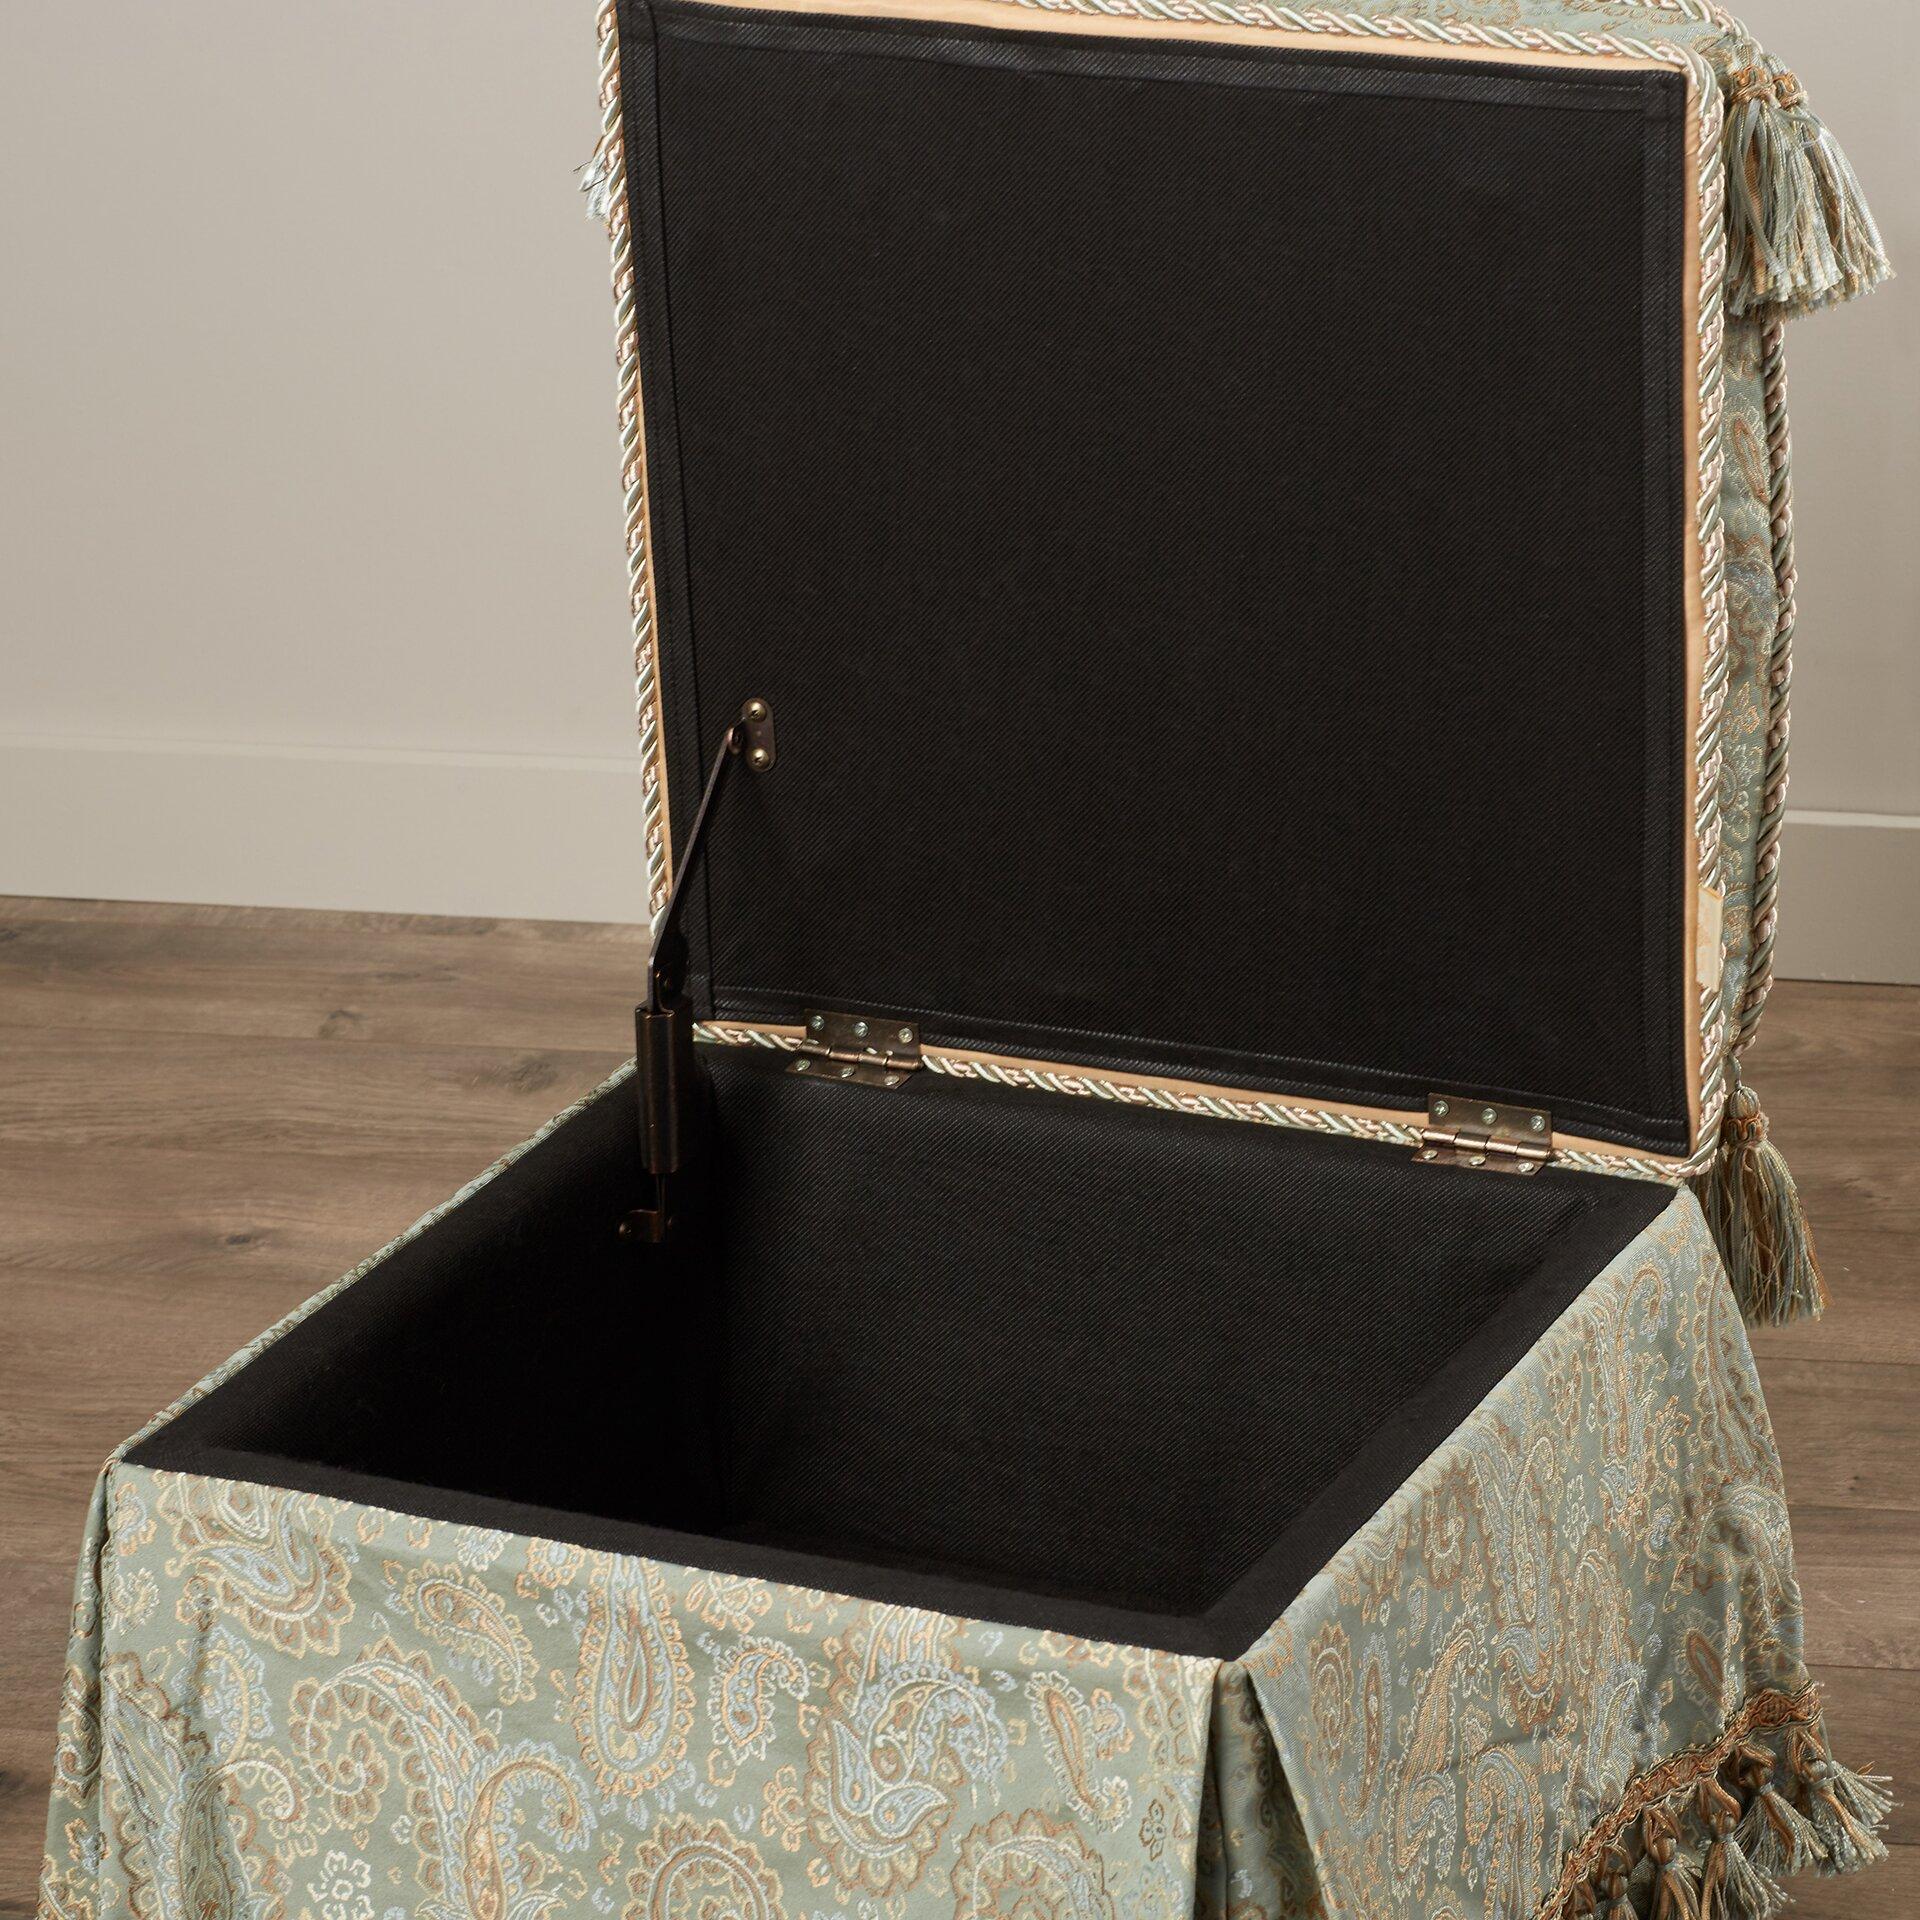 house of hampton yates storage vanity stool reviews wayfair. Black Bedroom Furniture Sets. Home Design Ideas